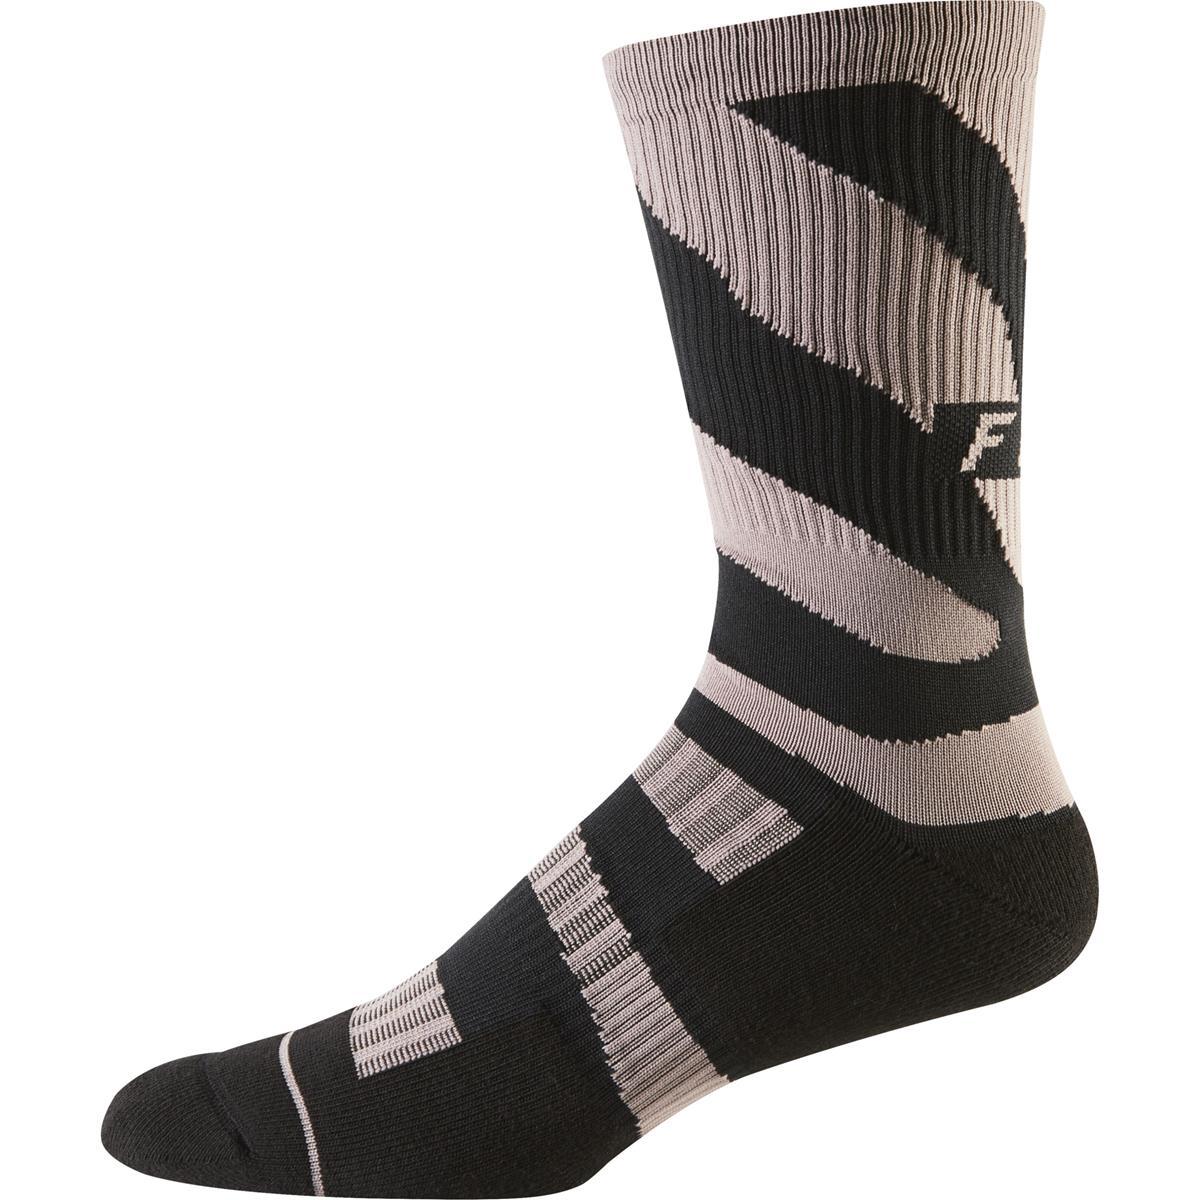 Fox Socken 8 Inch Trail Cushion Violett/Schwarz